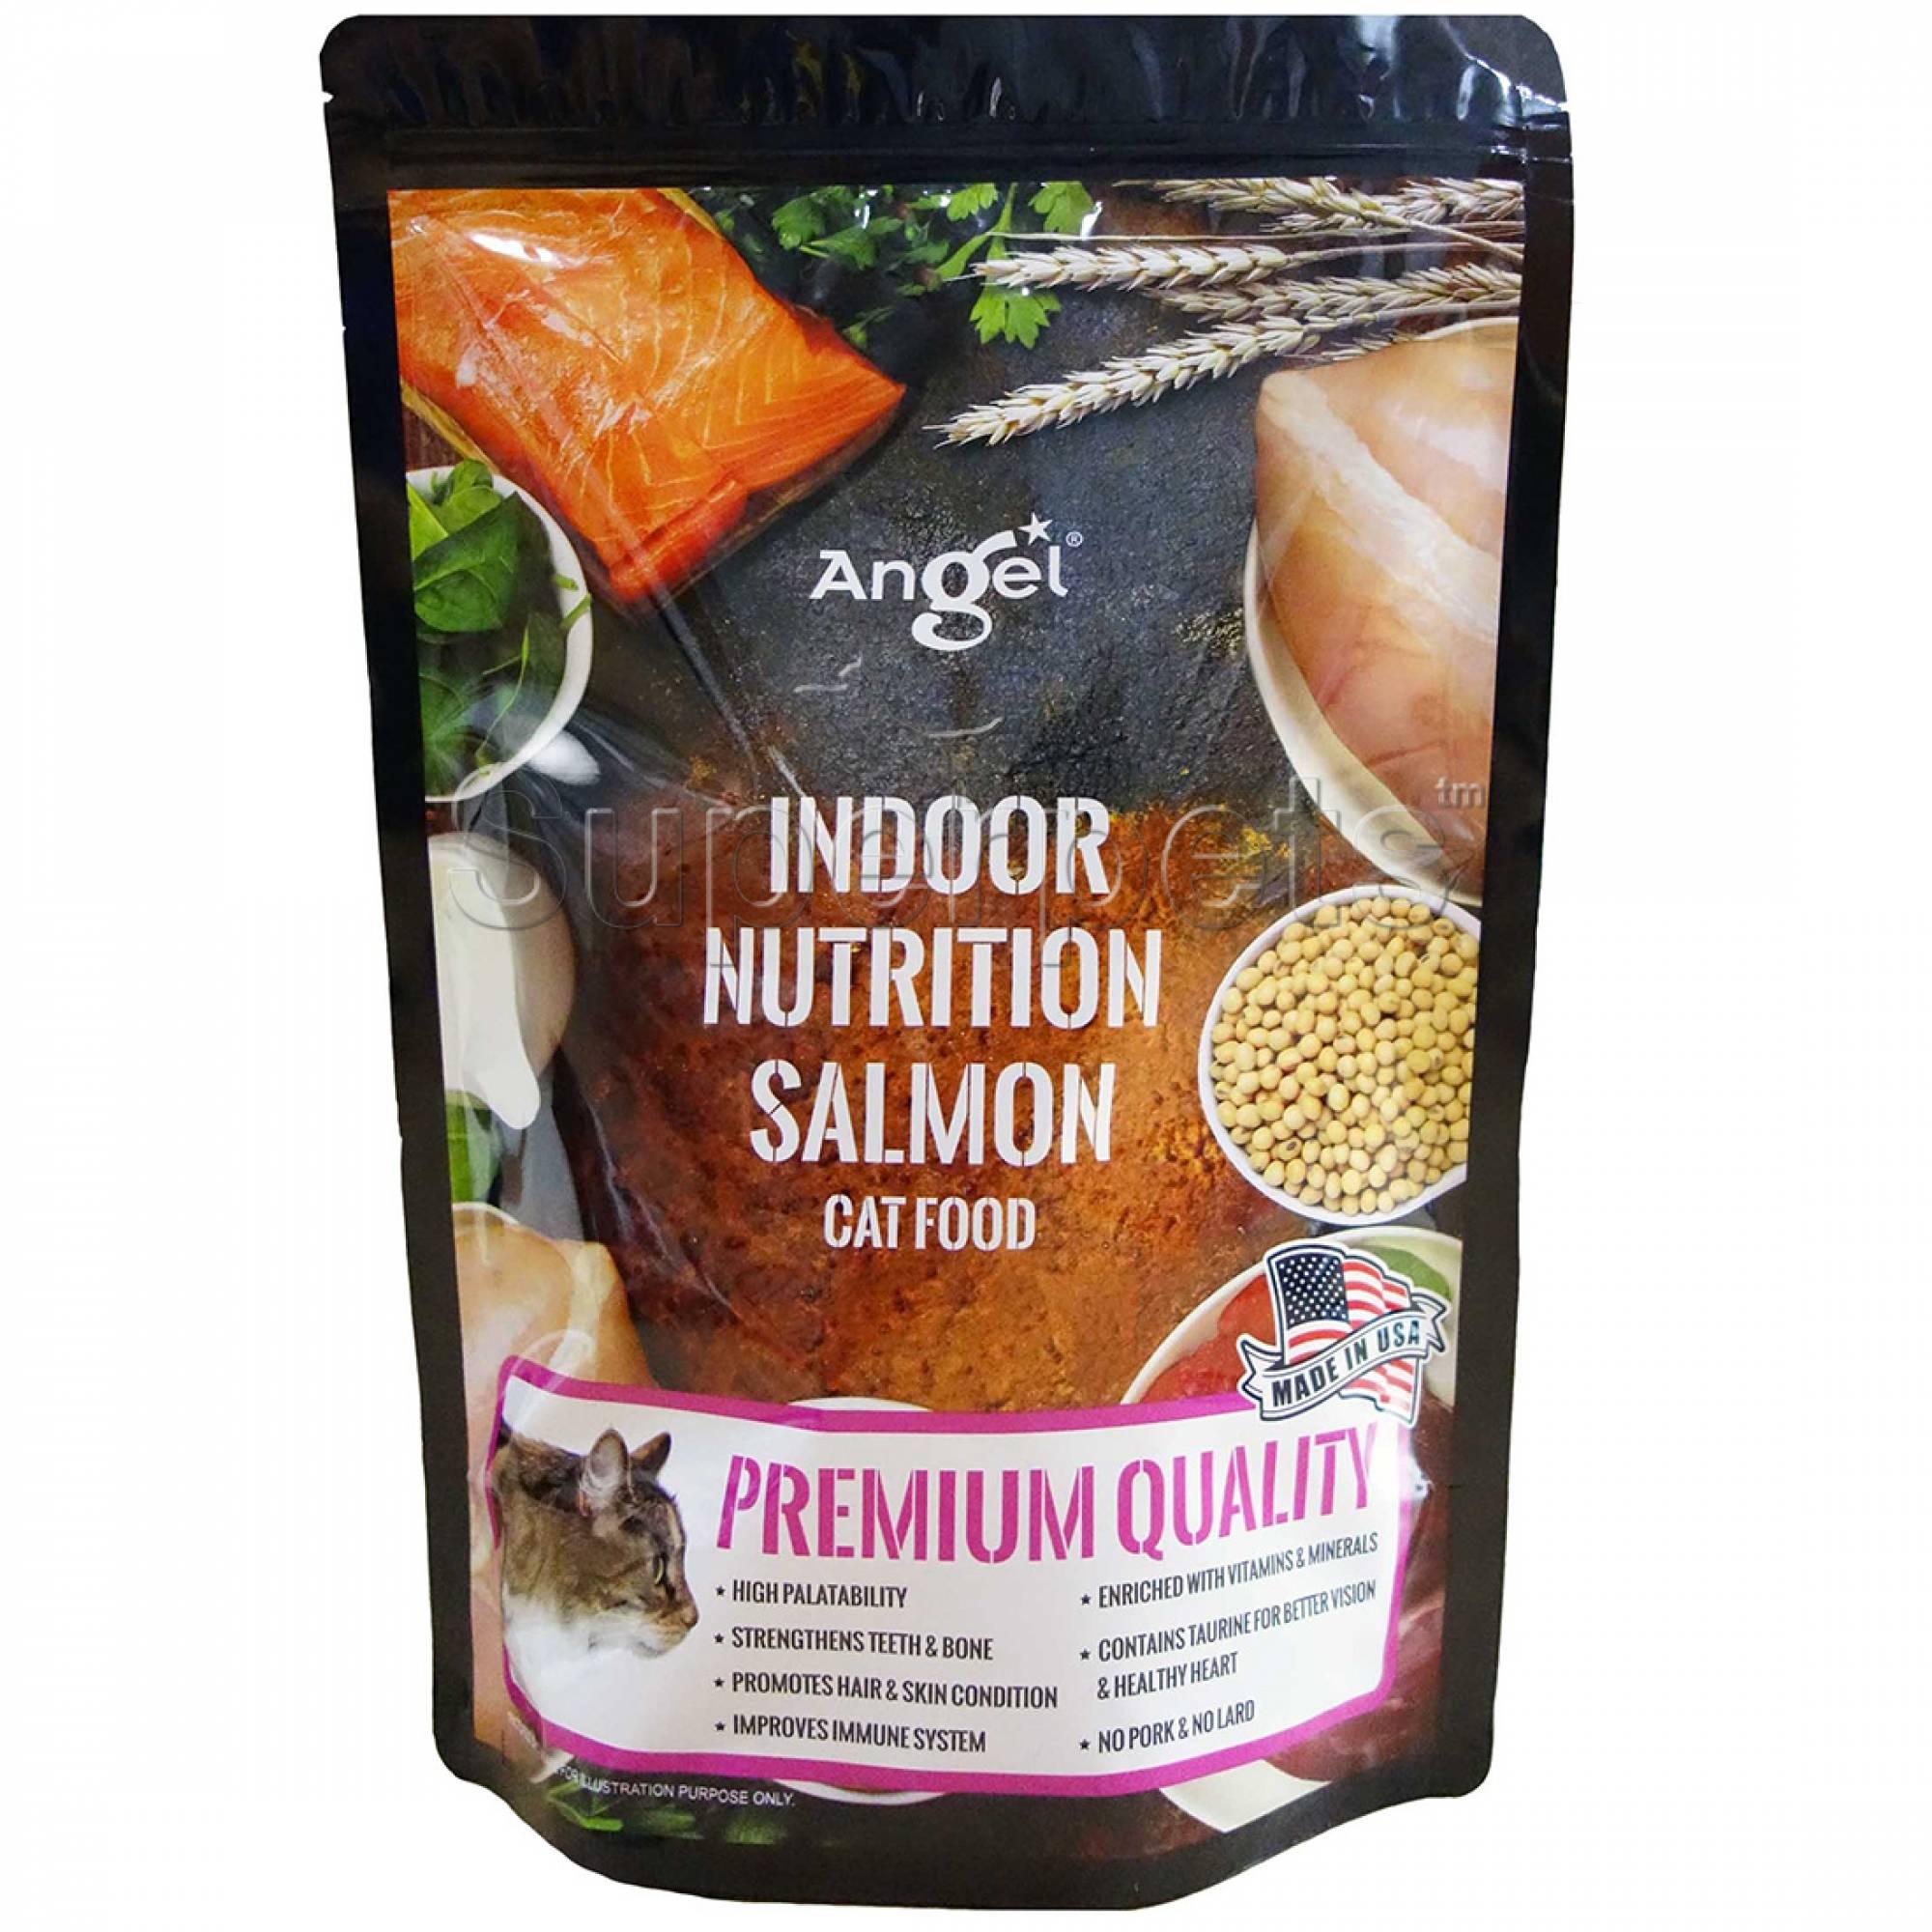 Angel - Indoor Nutrition Salmon Cat Food 1.1kg